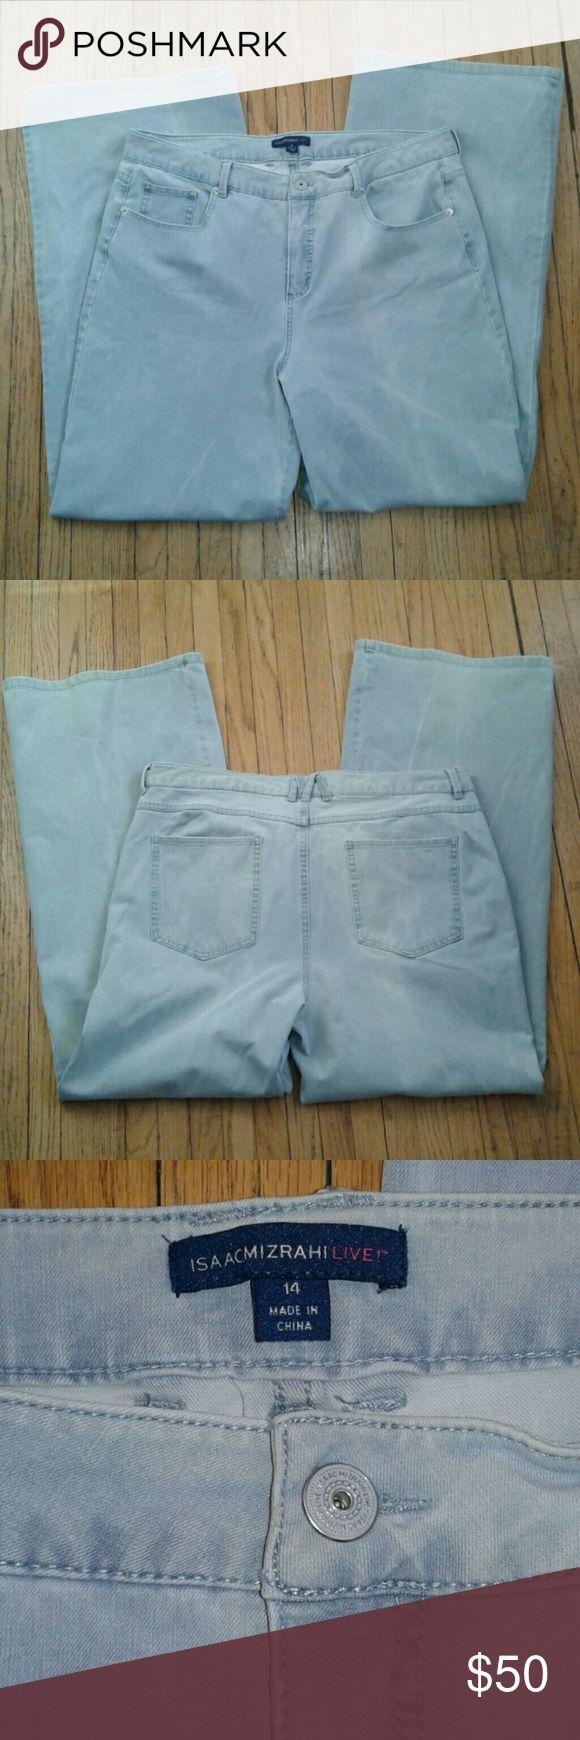 Isaac Mizrahi acid washed jeans Acid washed light blue jeans from isaac Mizrahi live. Like new! Waist 36. Rise 11.5. Inseam 31.5 Isaac Mizrahi Jeans Flare & Wide Leg